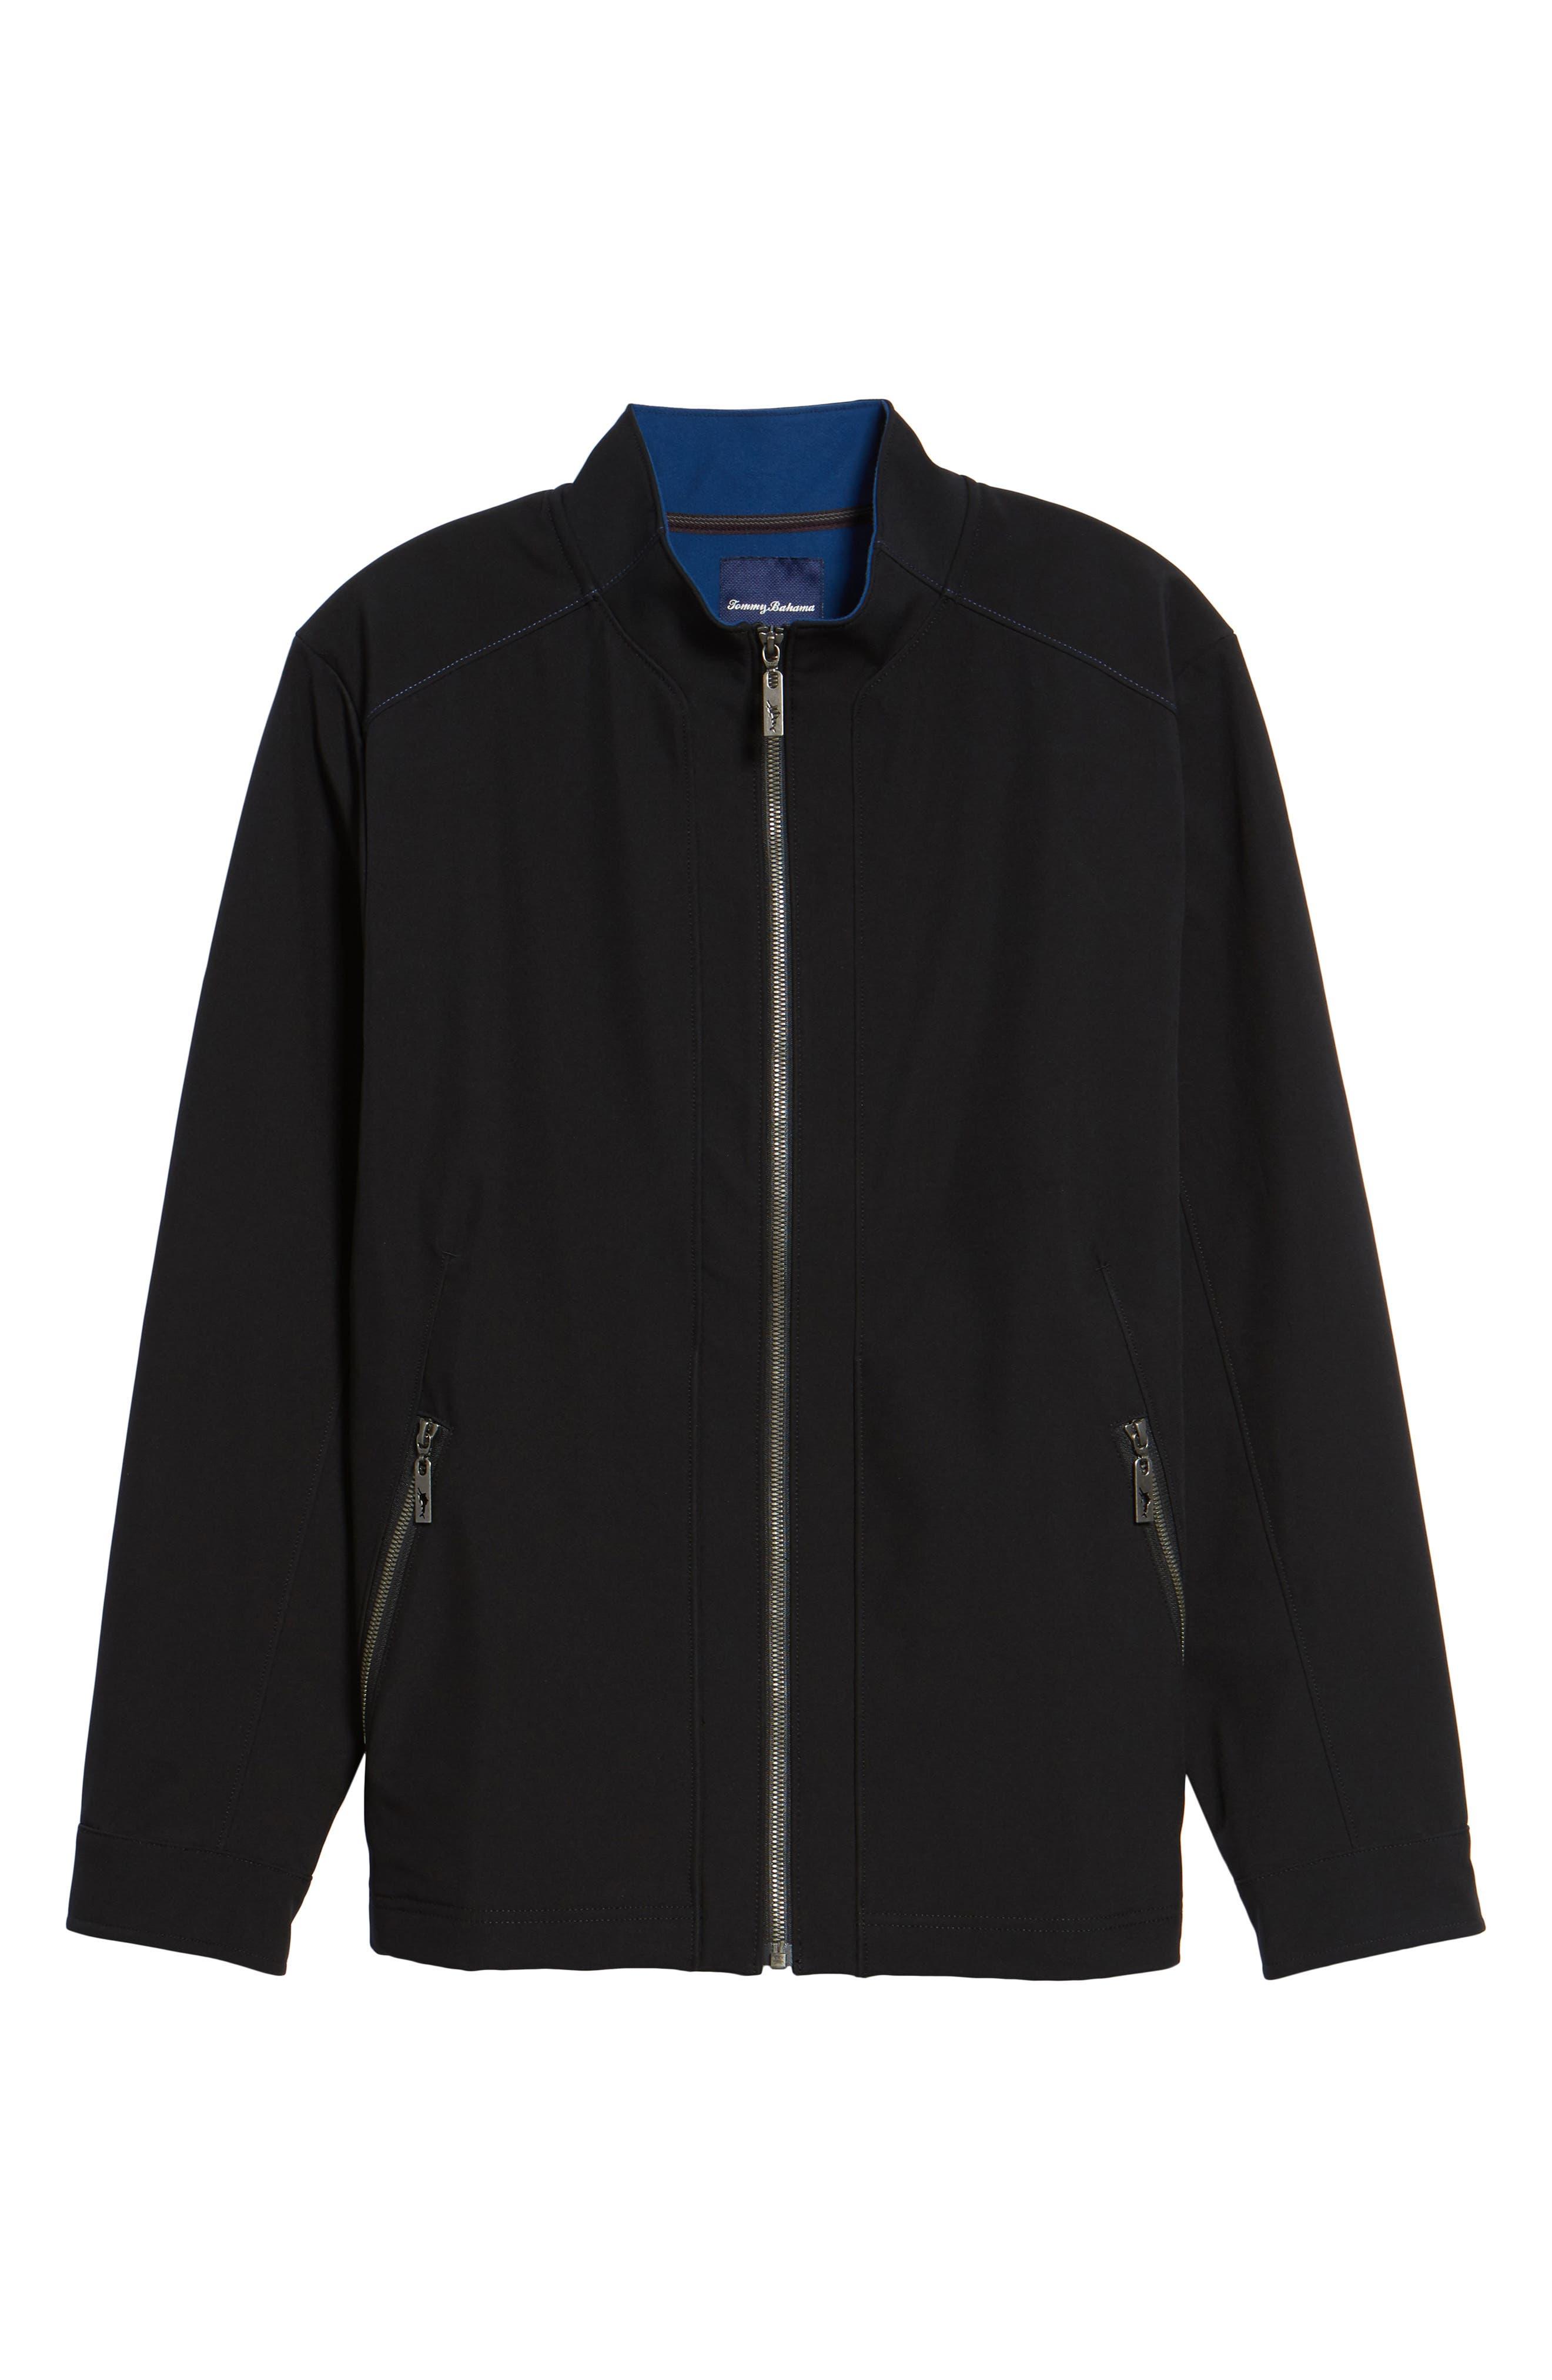 Downswing Zip Jacket,                             Alternate thumbnail 6, color,                             001